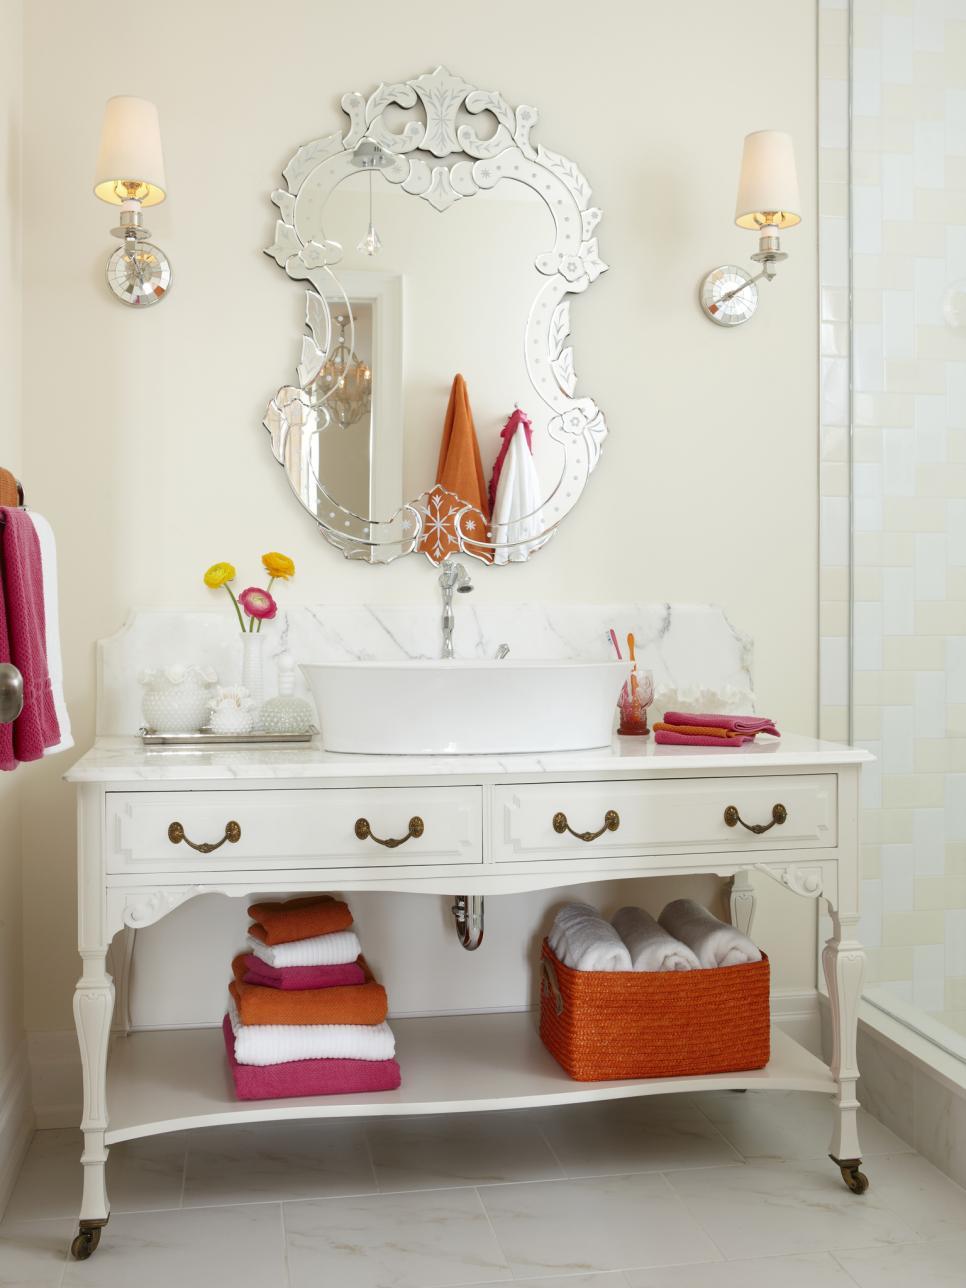 13 dreamy bathroom lighting ideas | hgtv SJLGXJF